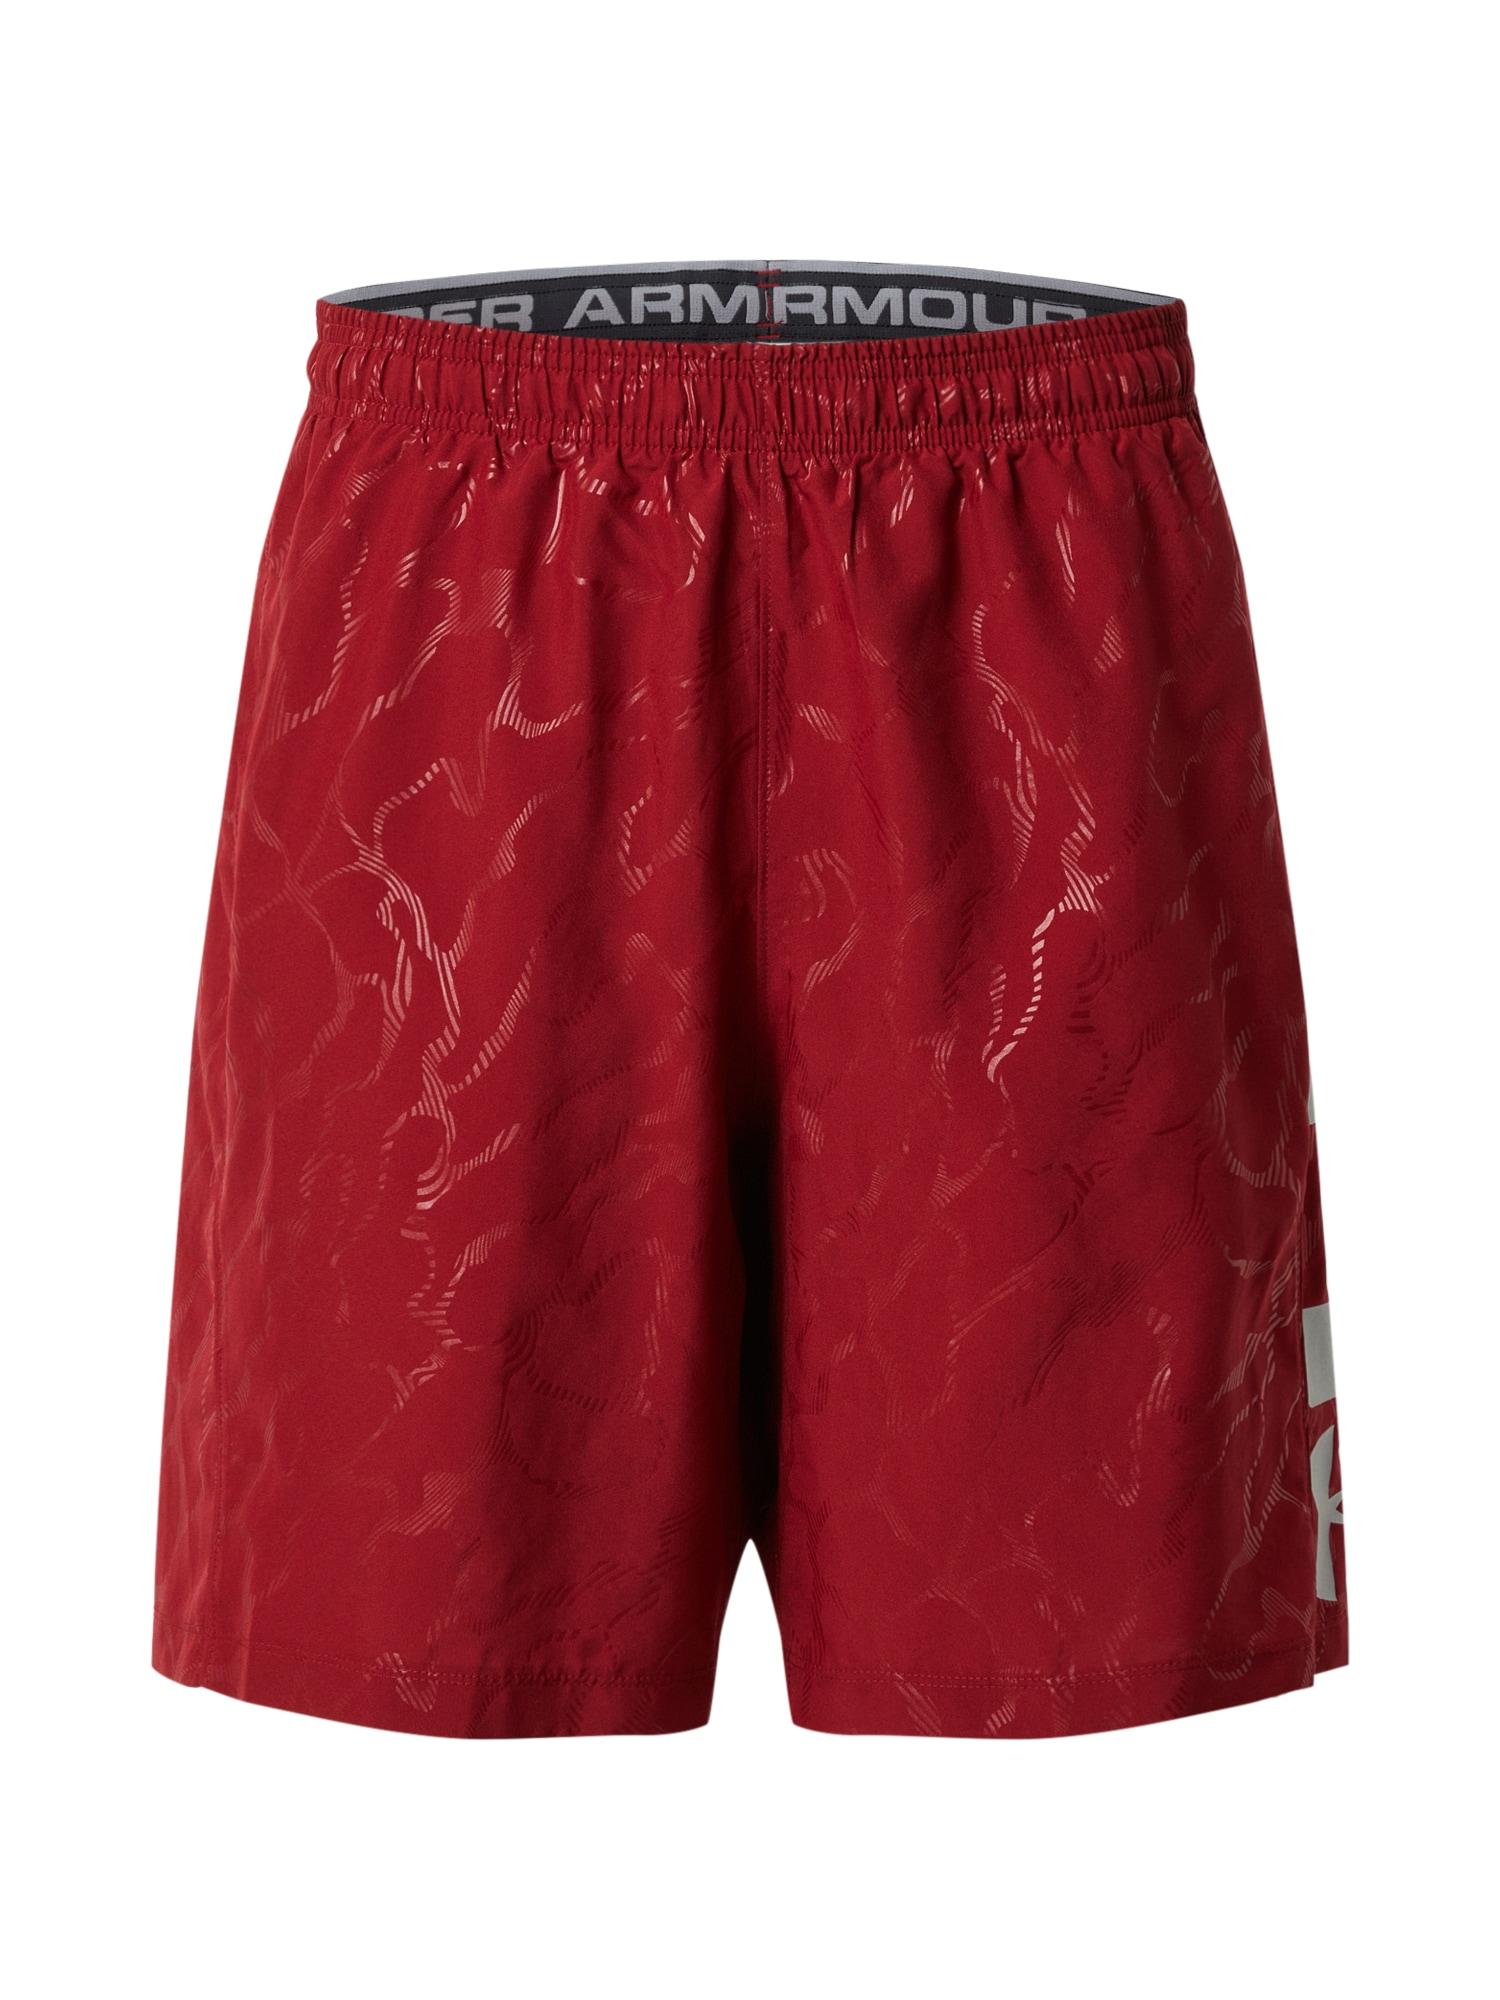 UNDER ARMOUR Športové nohavice  červené / vínovo červená